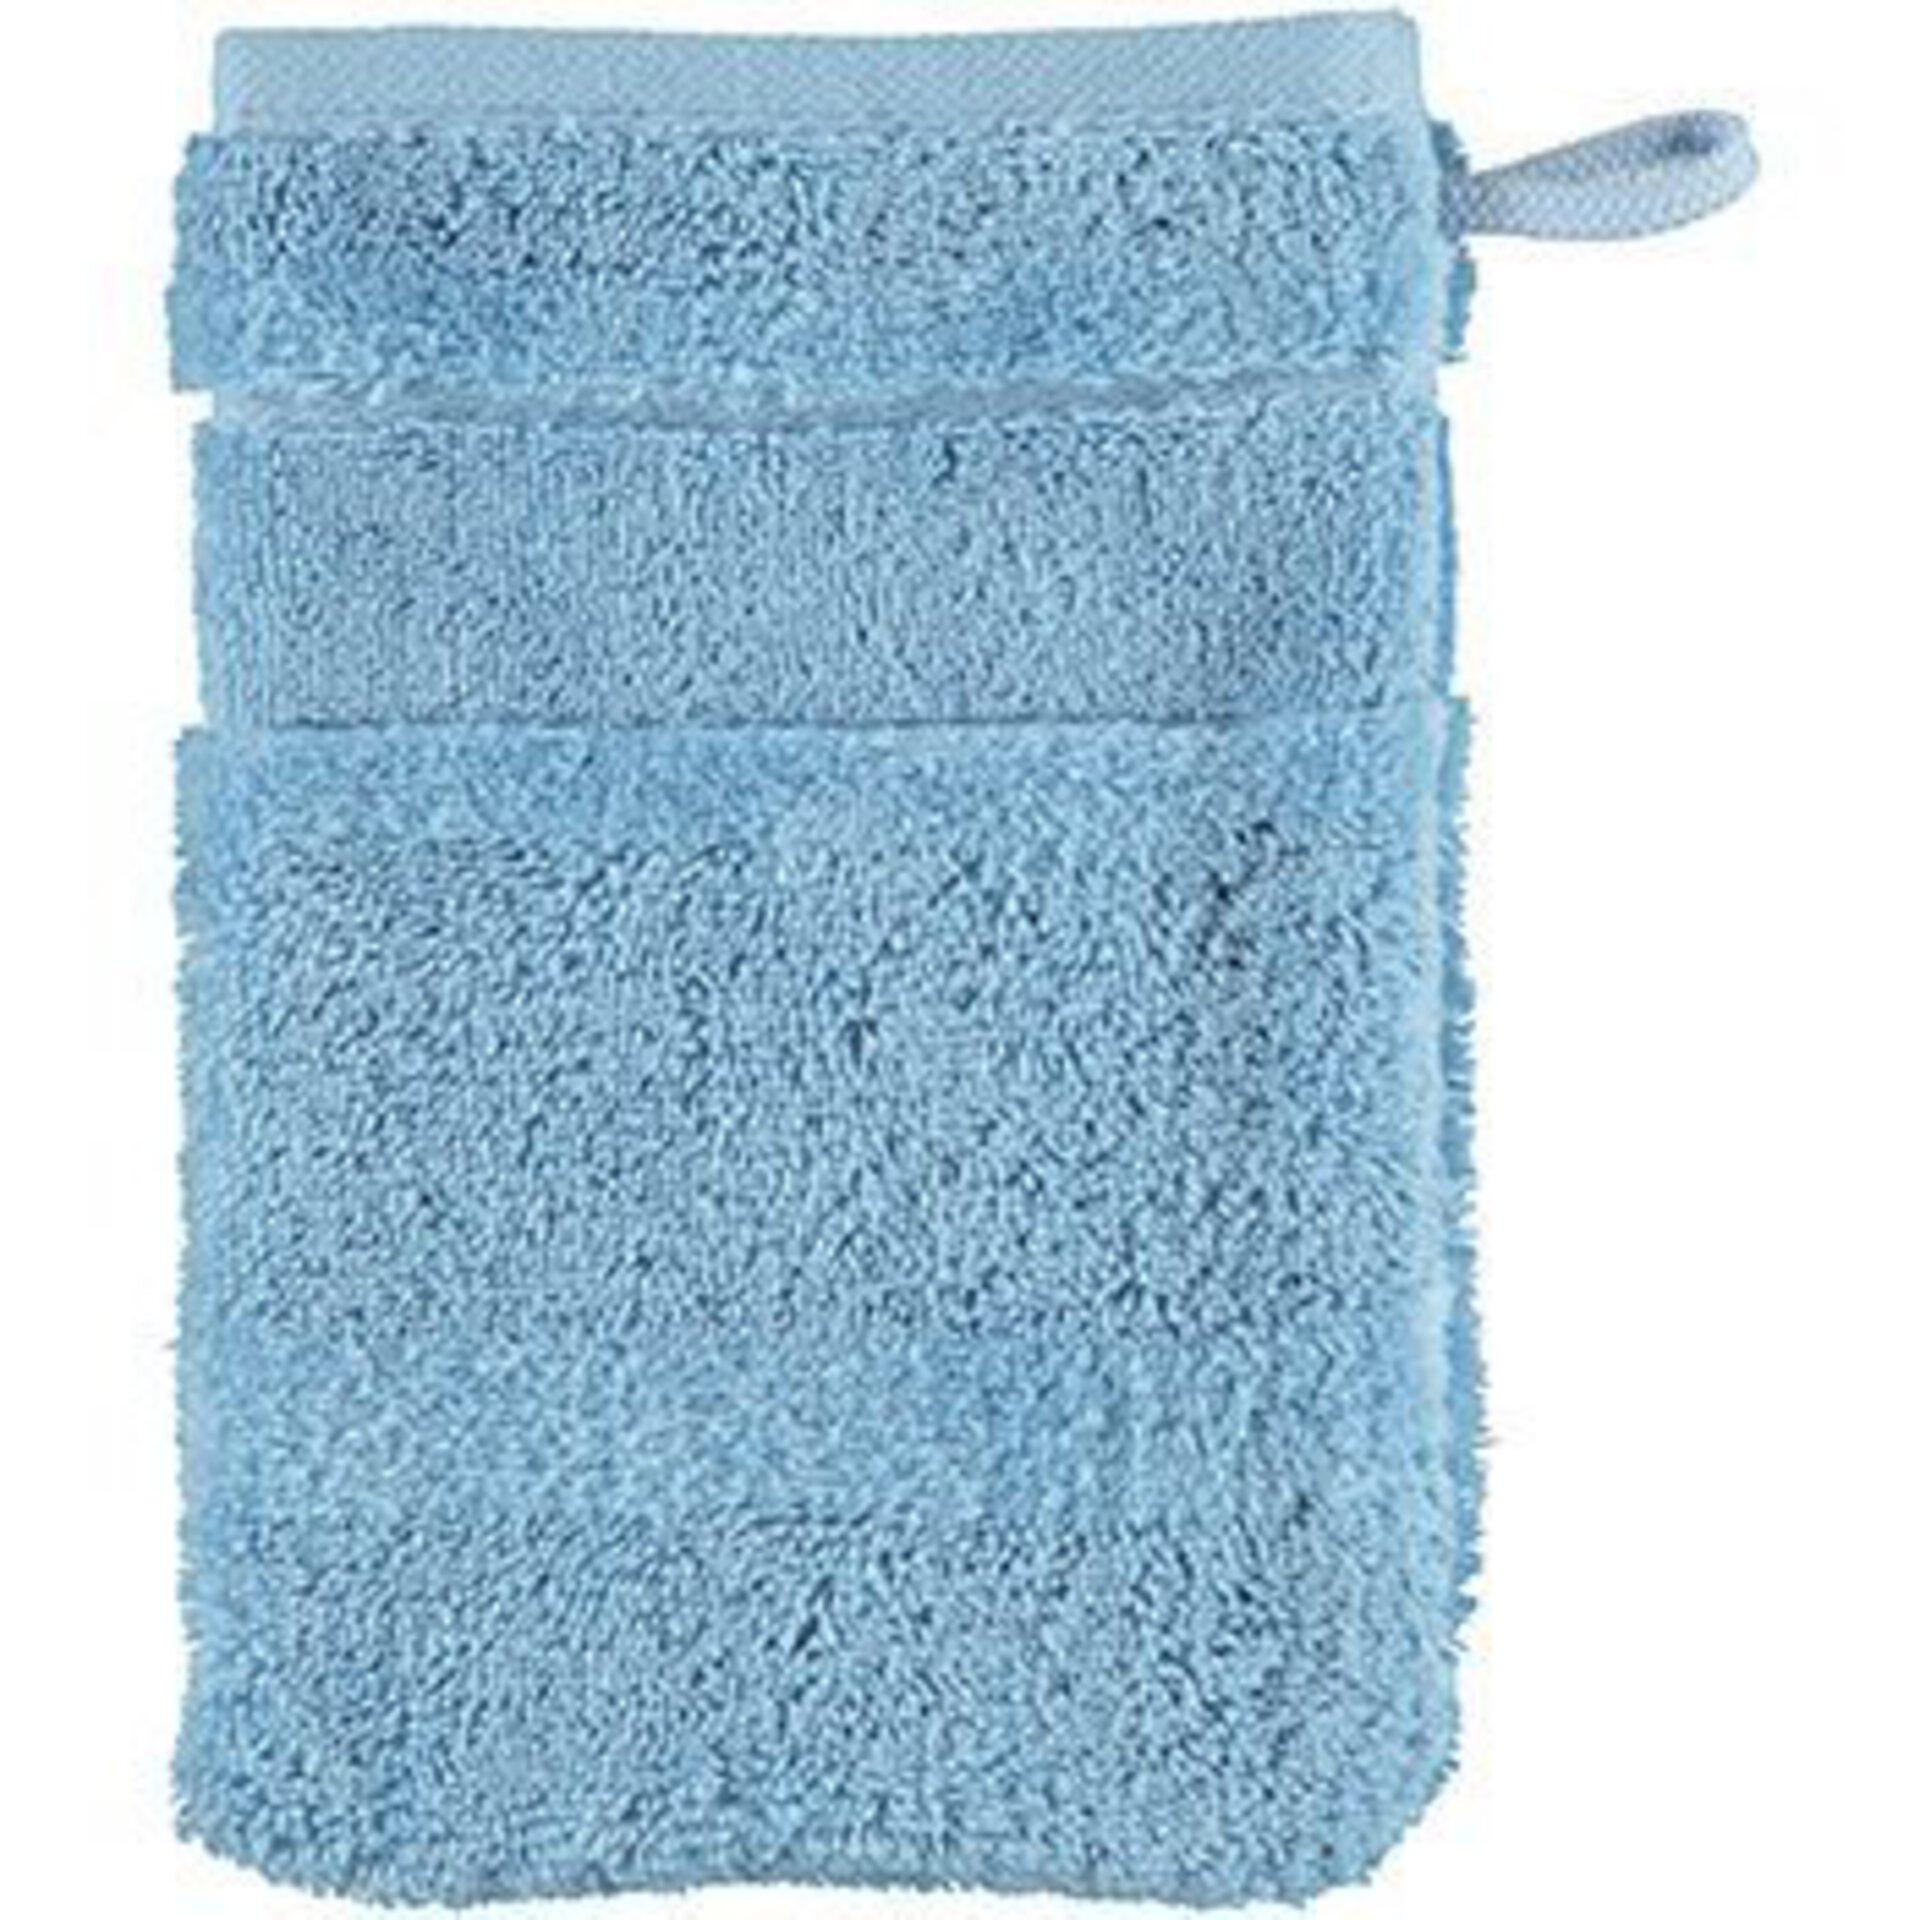 Waschhandschuh Cawö Textil Blau 16 x 22 cm